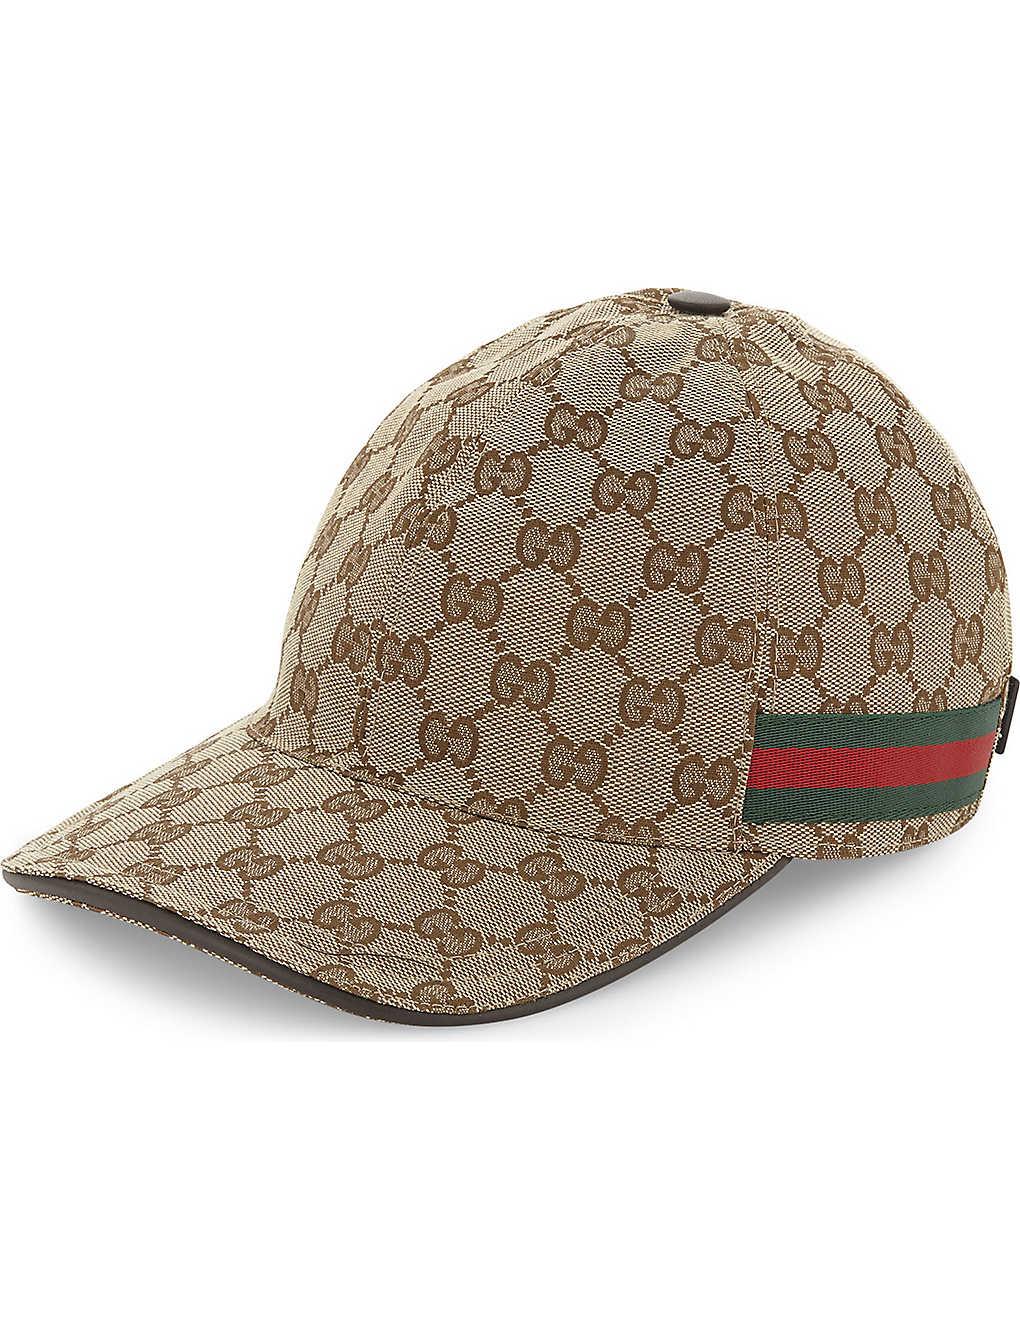 GUCCI - GG Web stripe baseball cap  c5c847ae8ef9